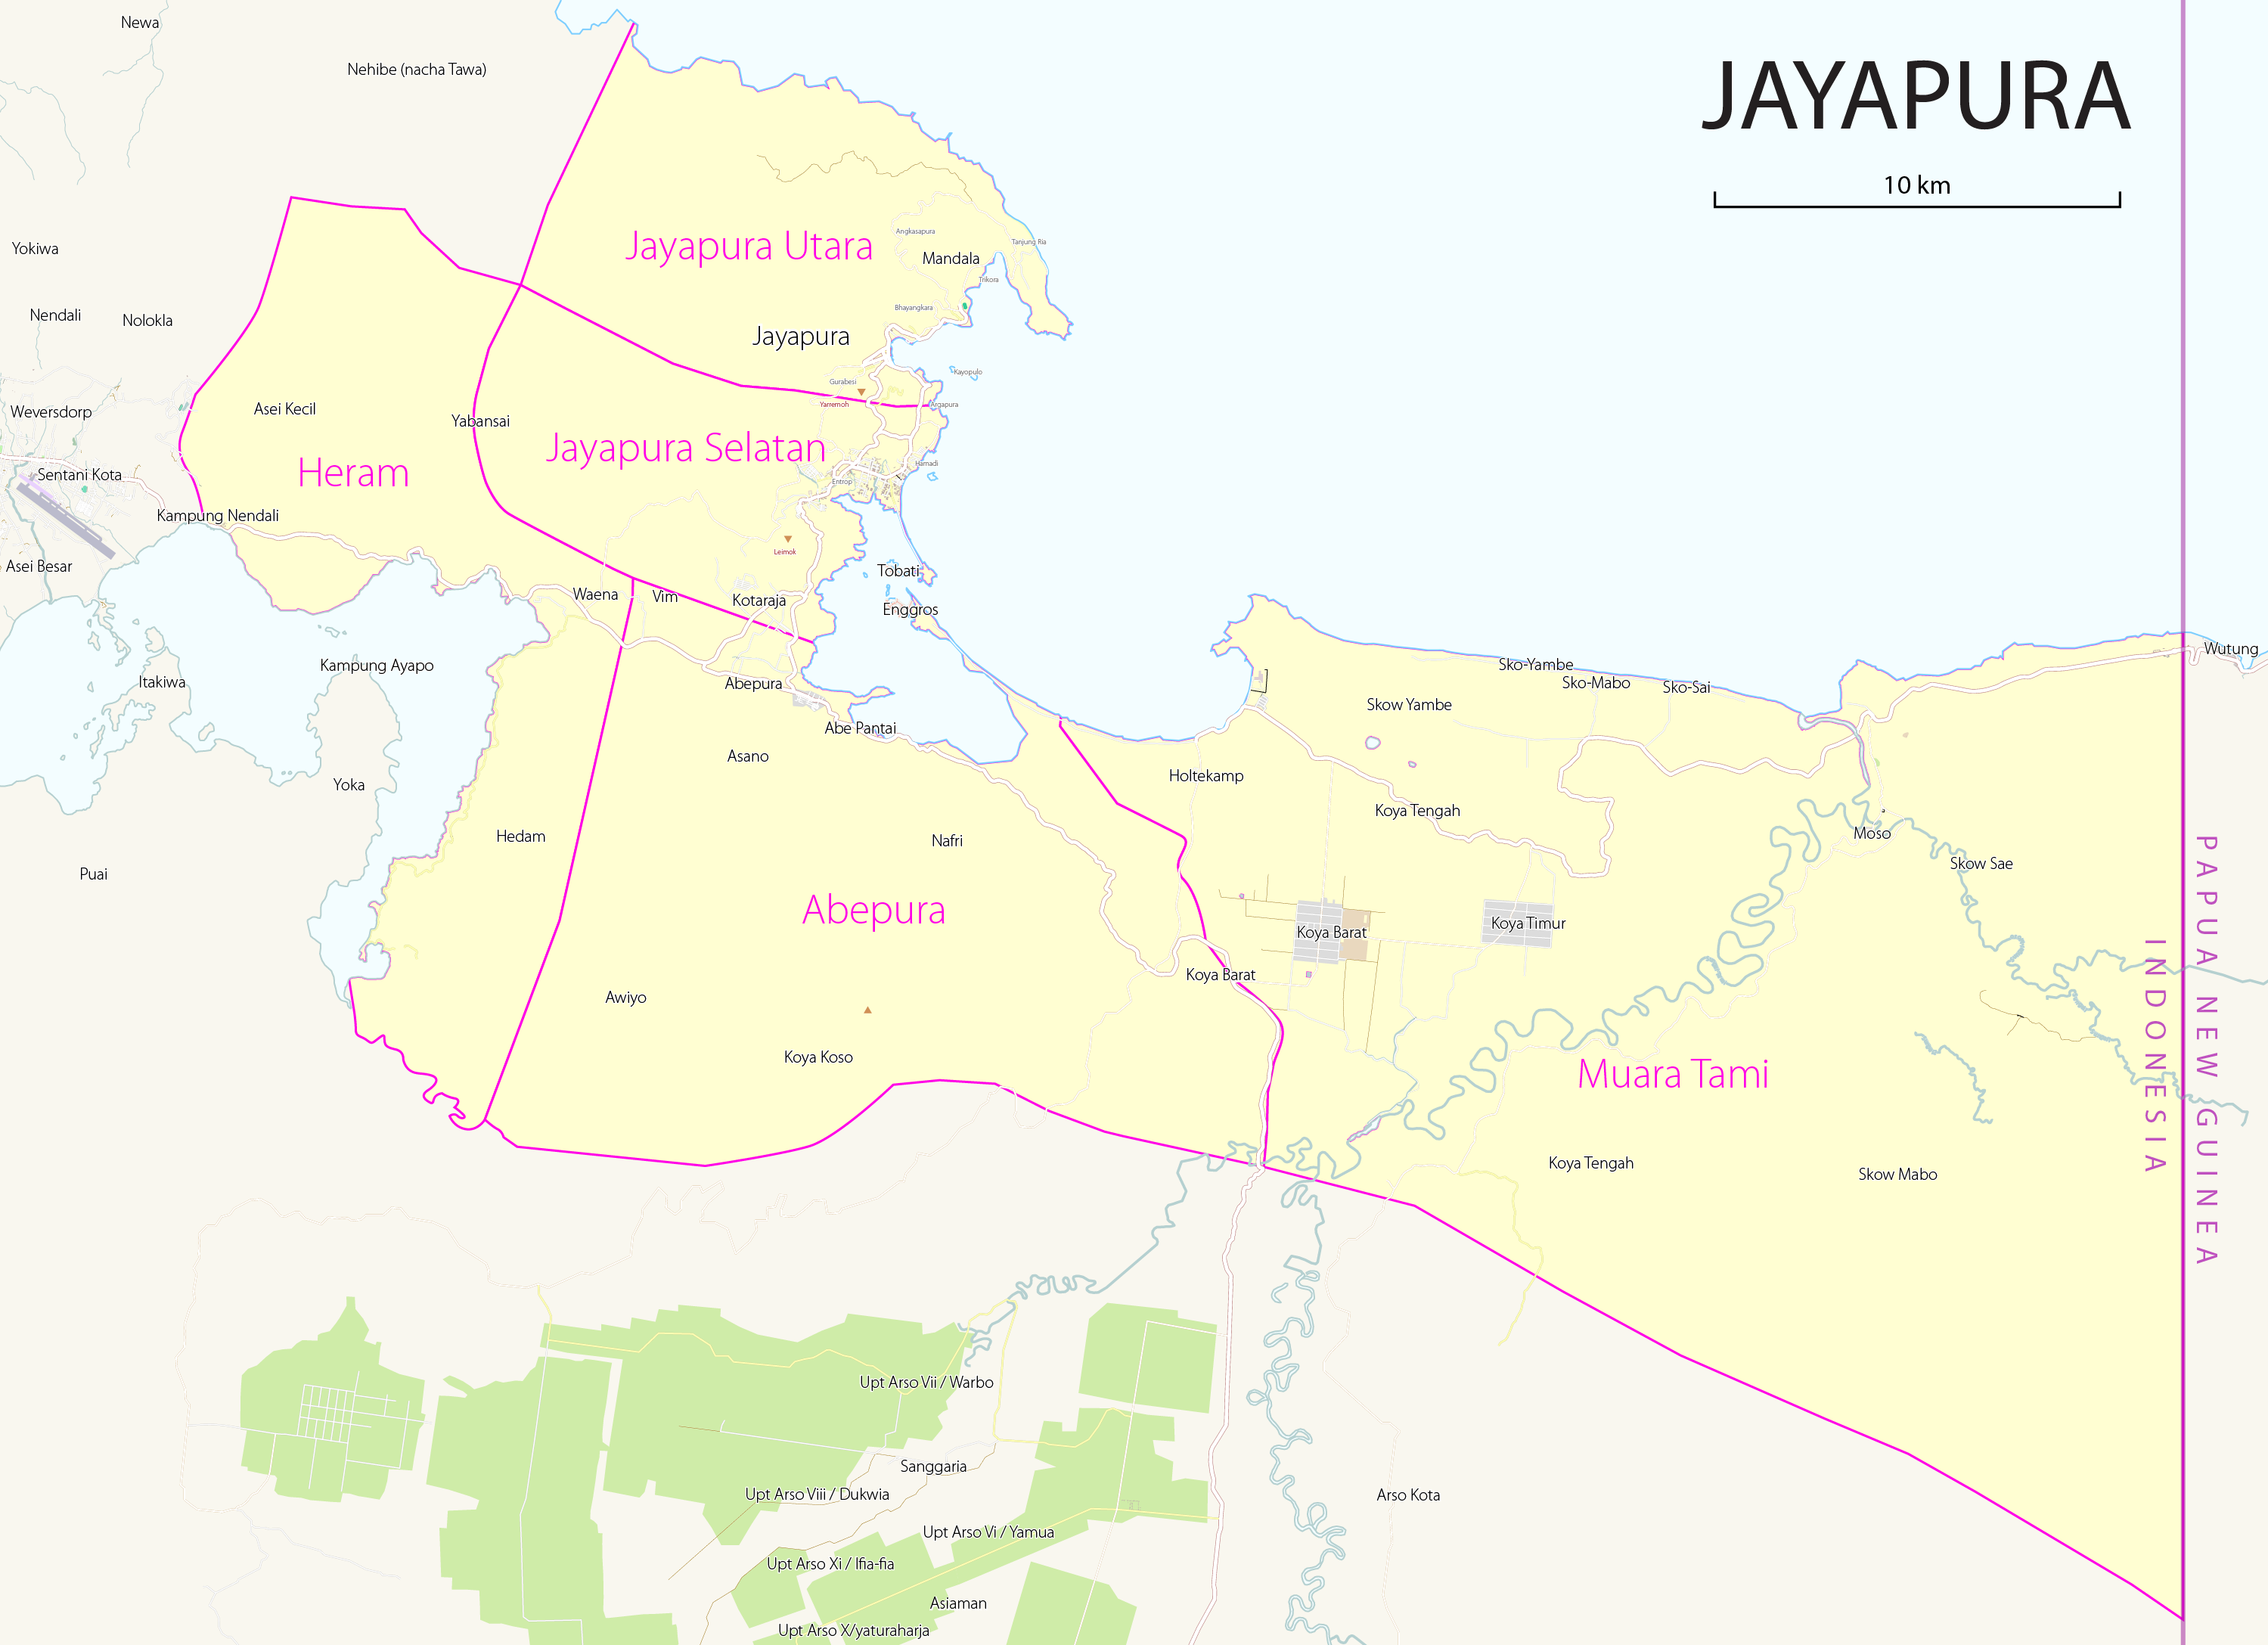 Berkas Map Districts Kecamatan Of Jayapura Png Wikipedia Bahasa Indonesia Ensiklopedia Bebas